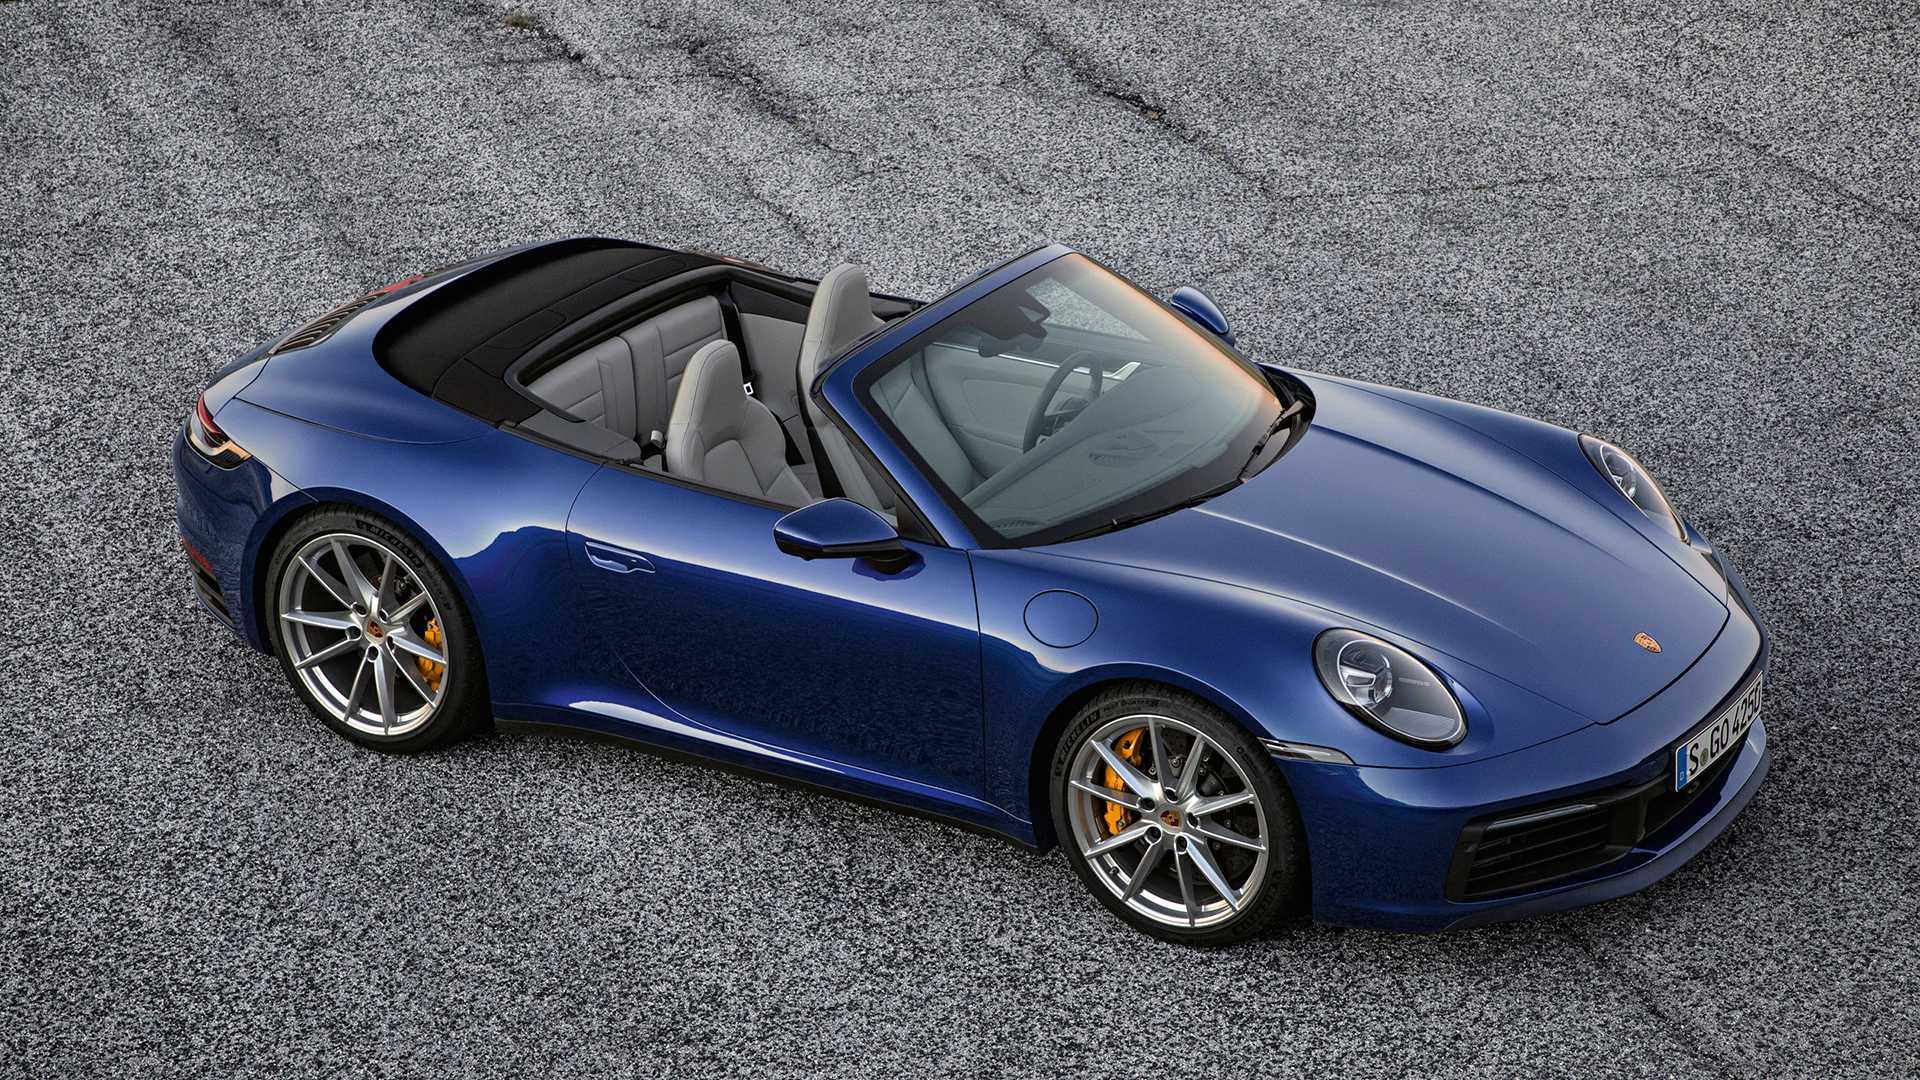 2020-porsche-911-cabriolet-trinh-lang-3-1.jpg